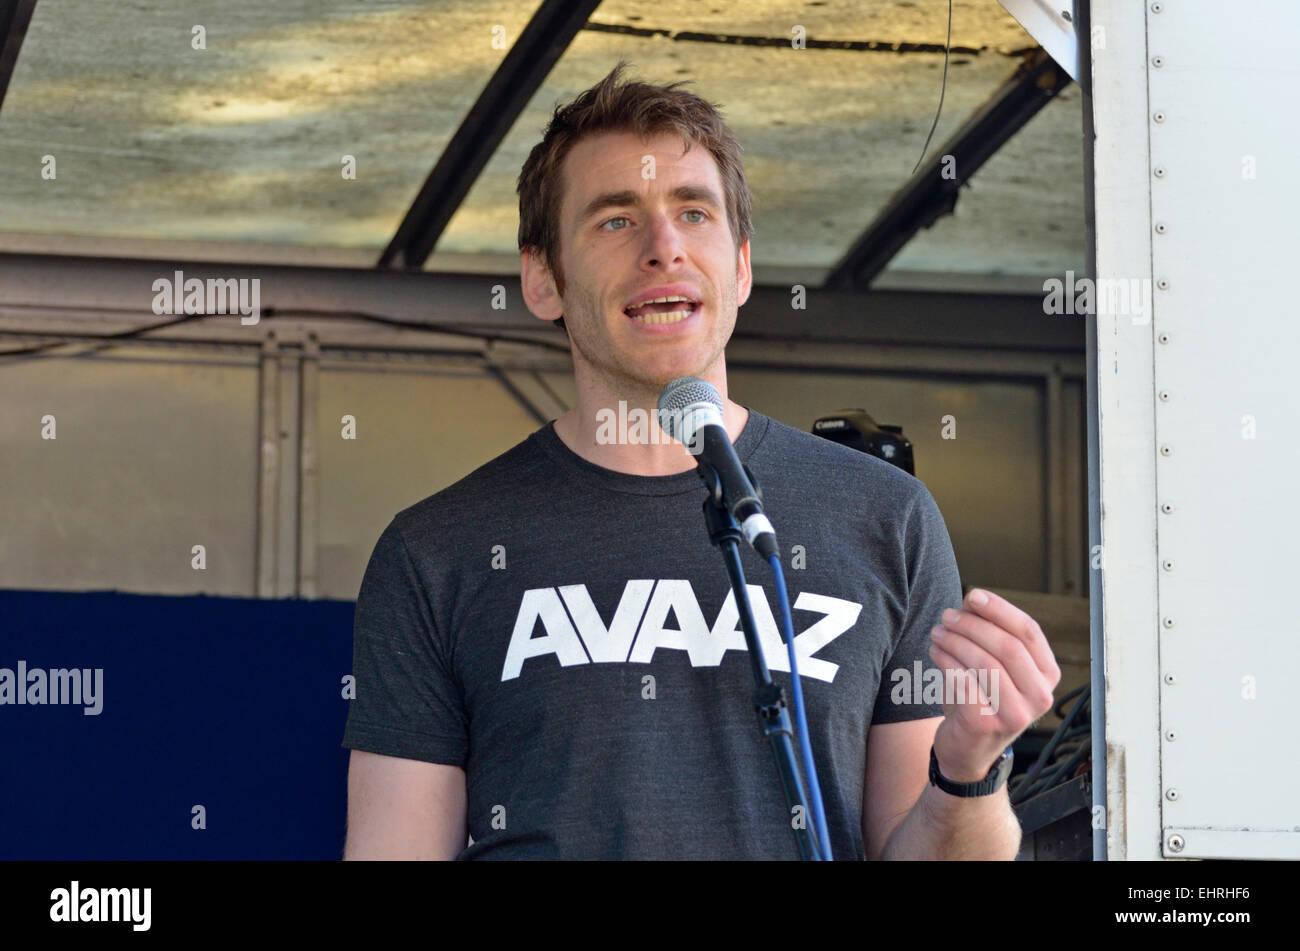 Bert Wander,  Media Campaigner (London) for AVAAZ.org - online activist organisation -  speaking in London 2015 - Stock Image